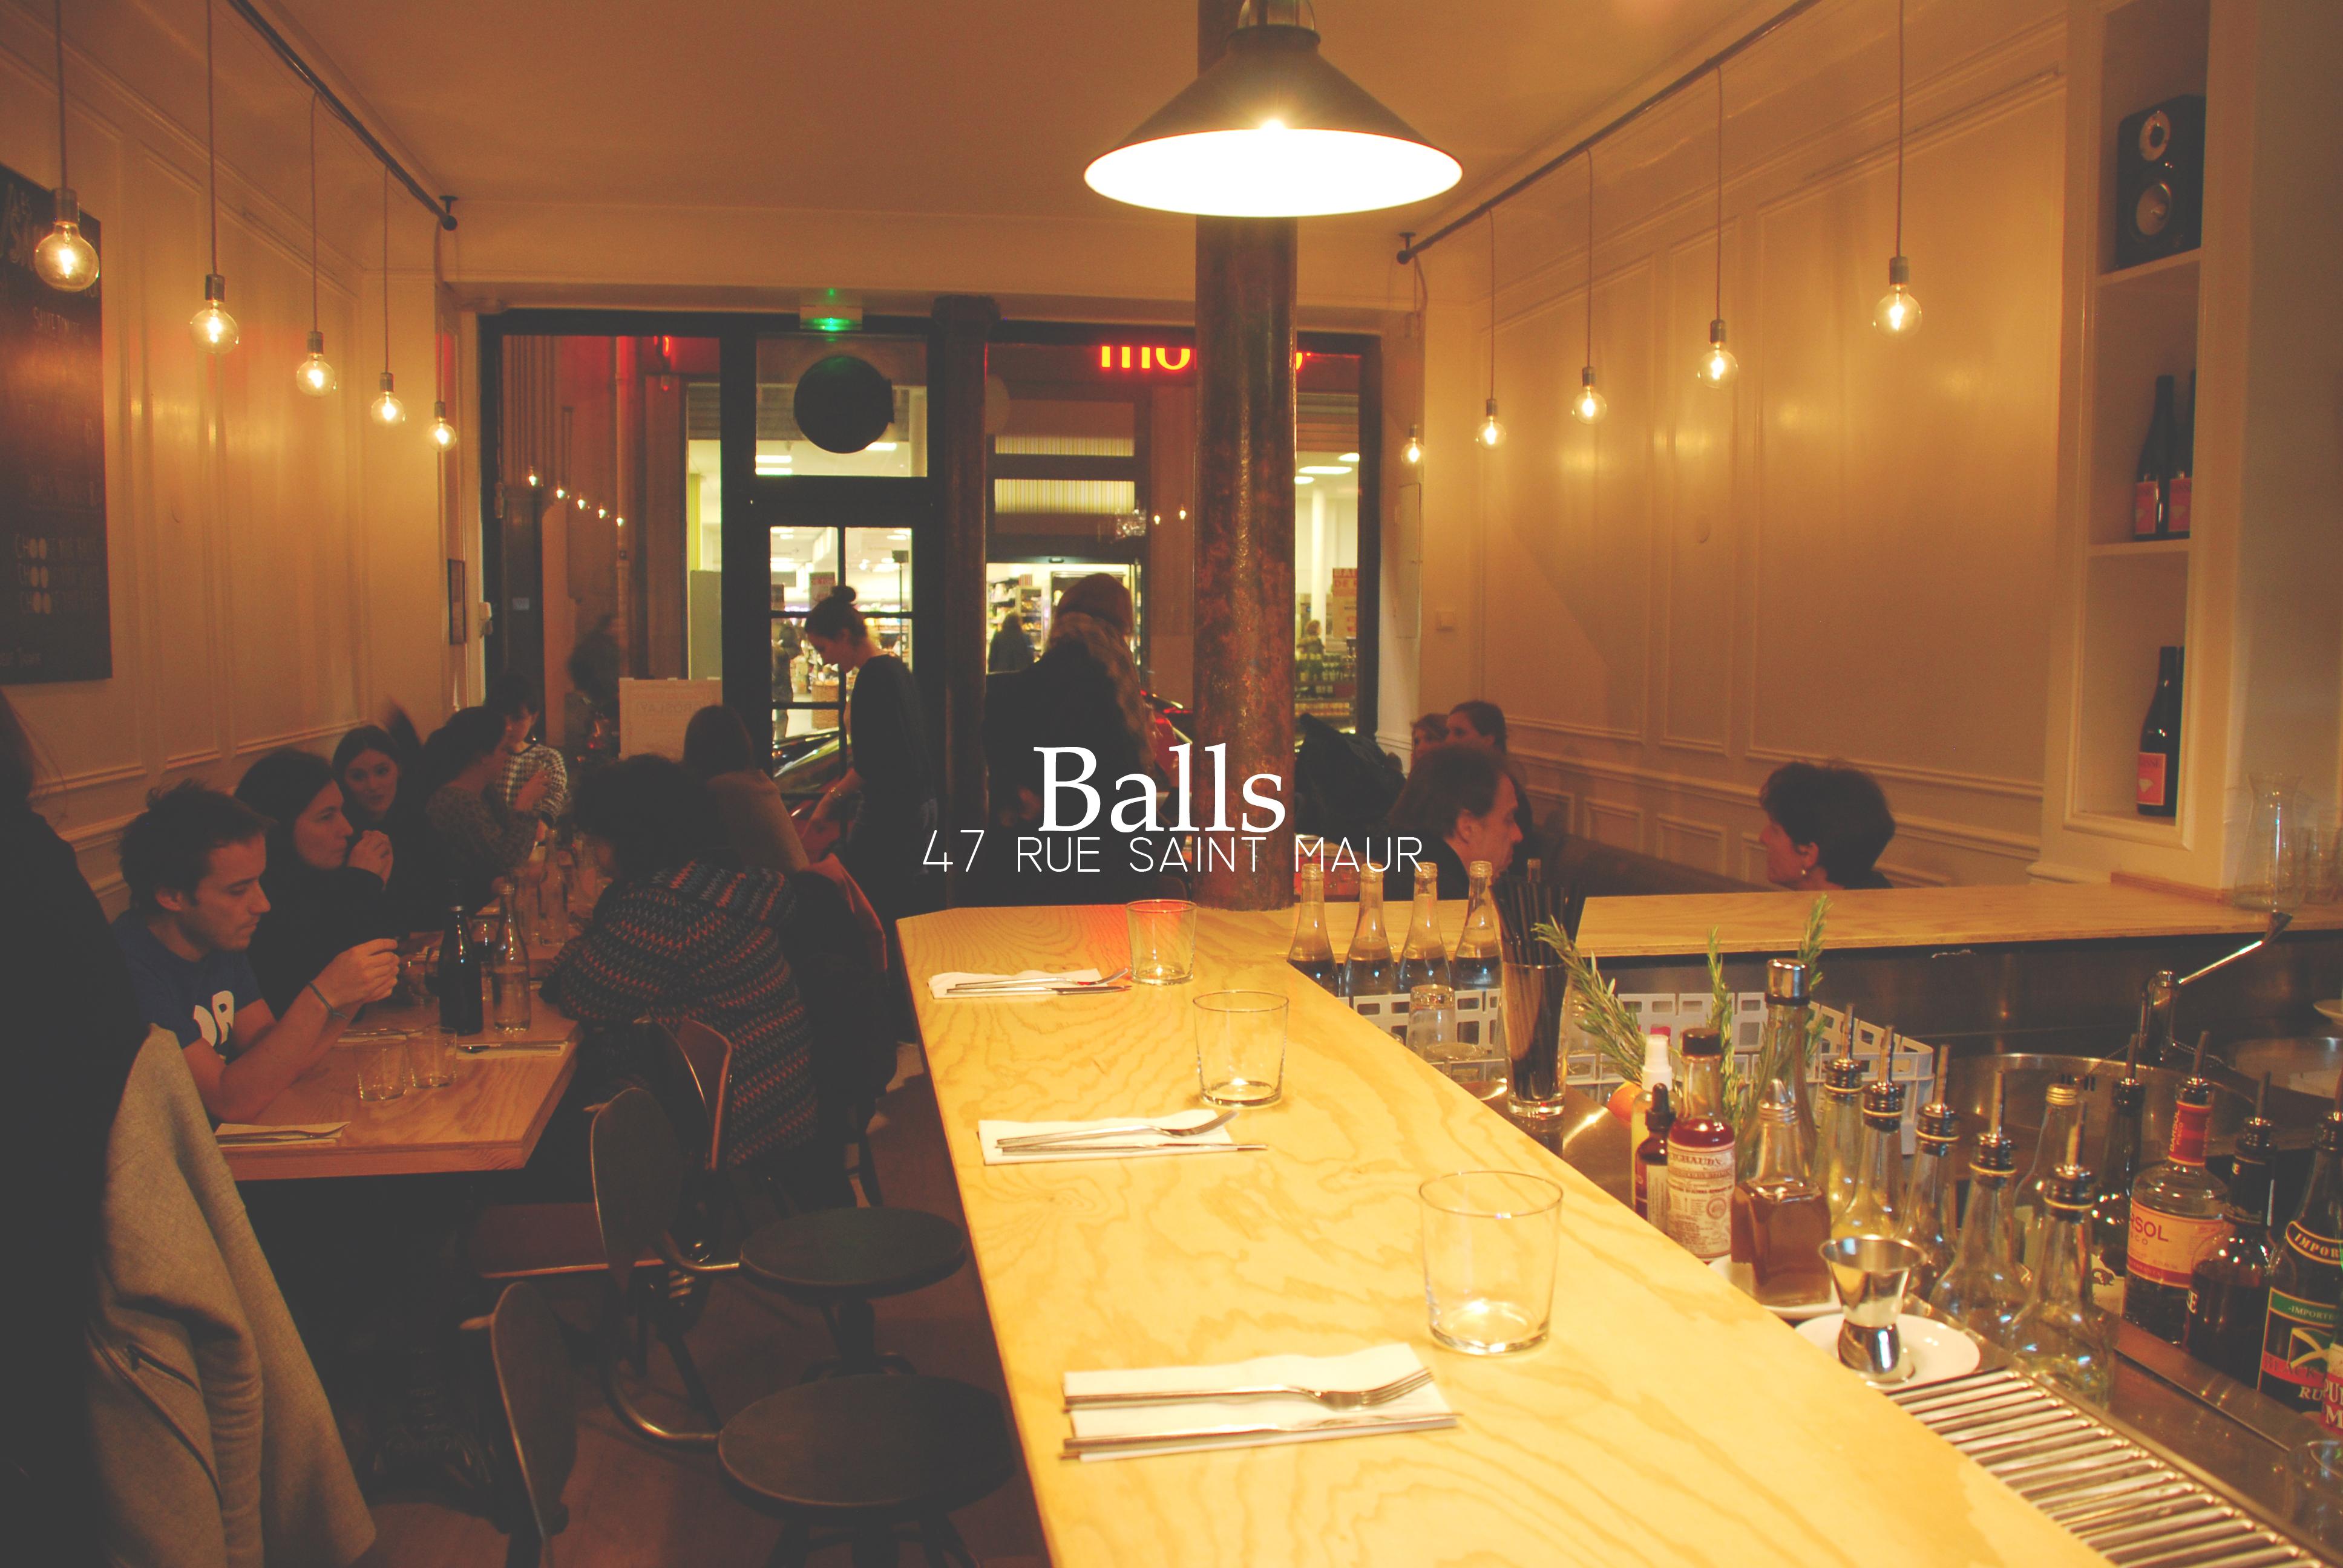 gyoza bar un deuxieme restaurant rue de saintonge le poly dre. Black Bedroom Furniture Sets. Home Design Ideas